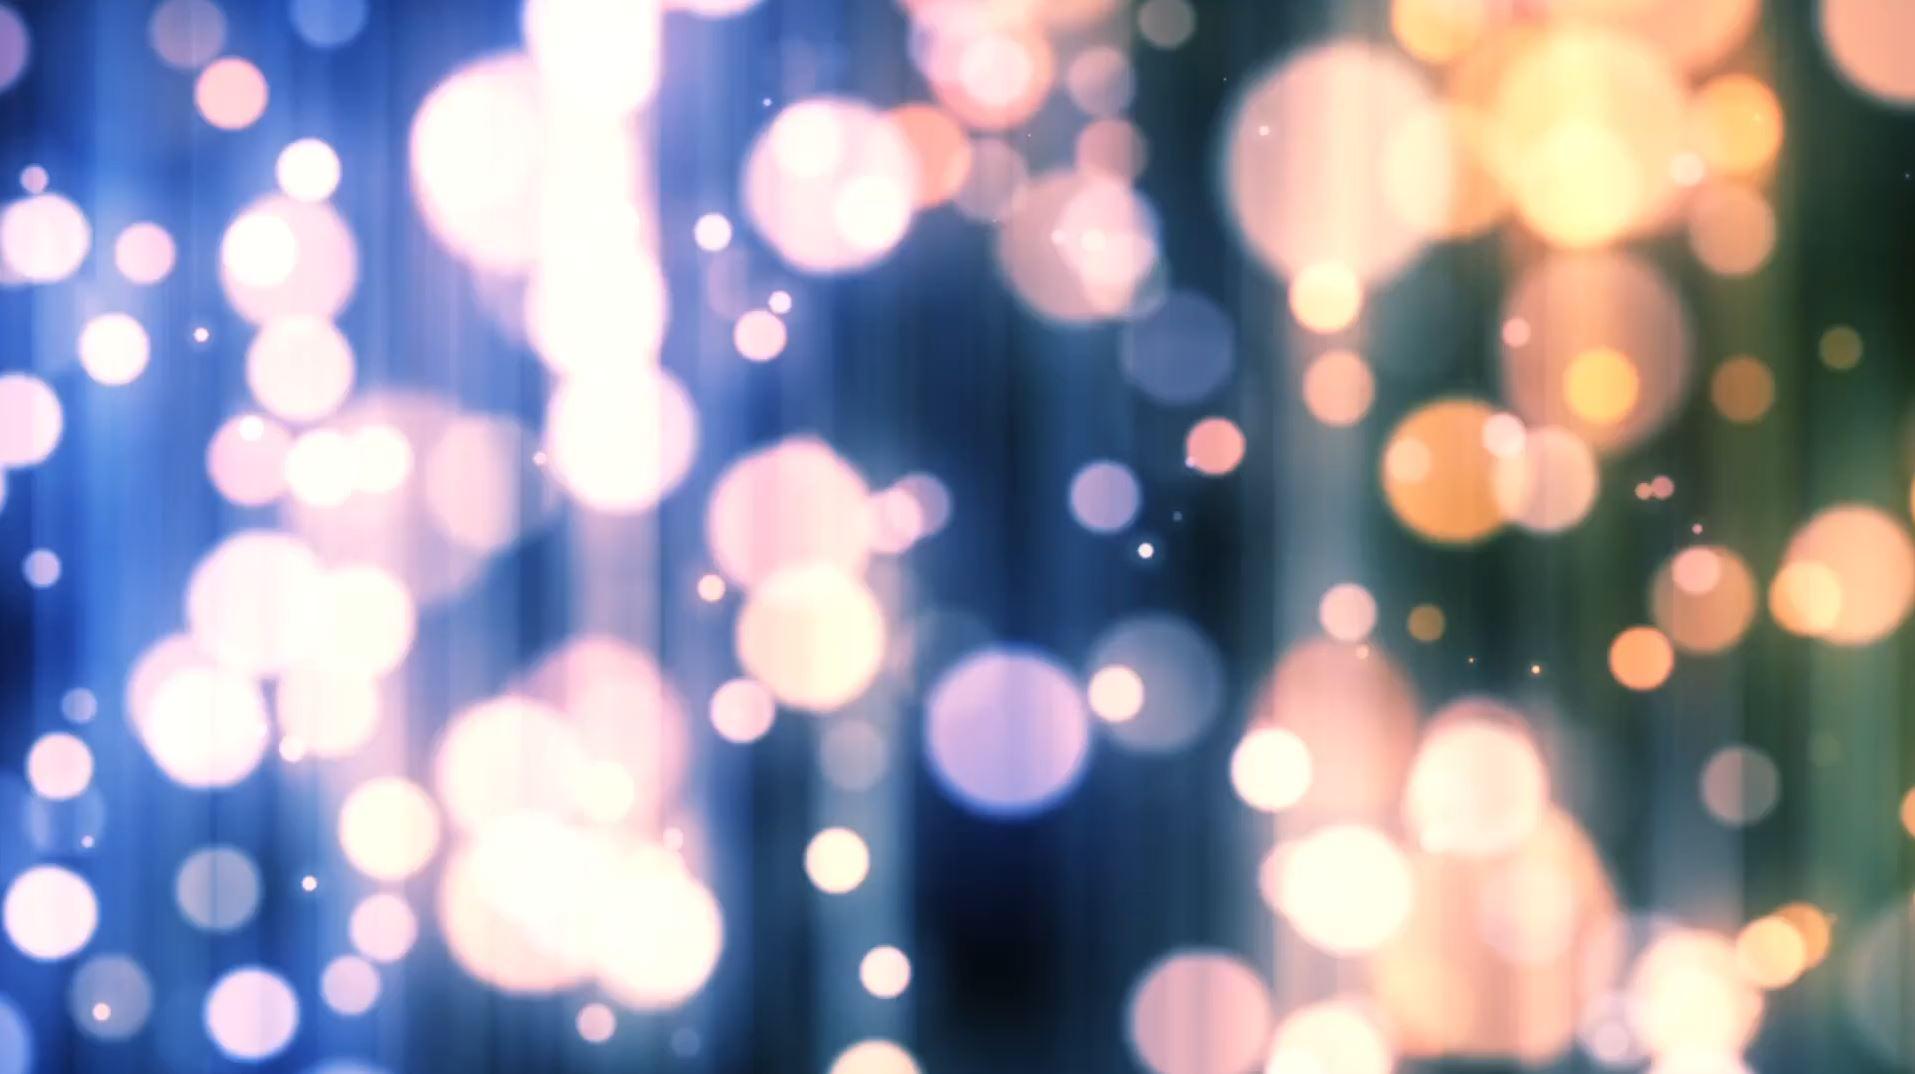 Particle